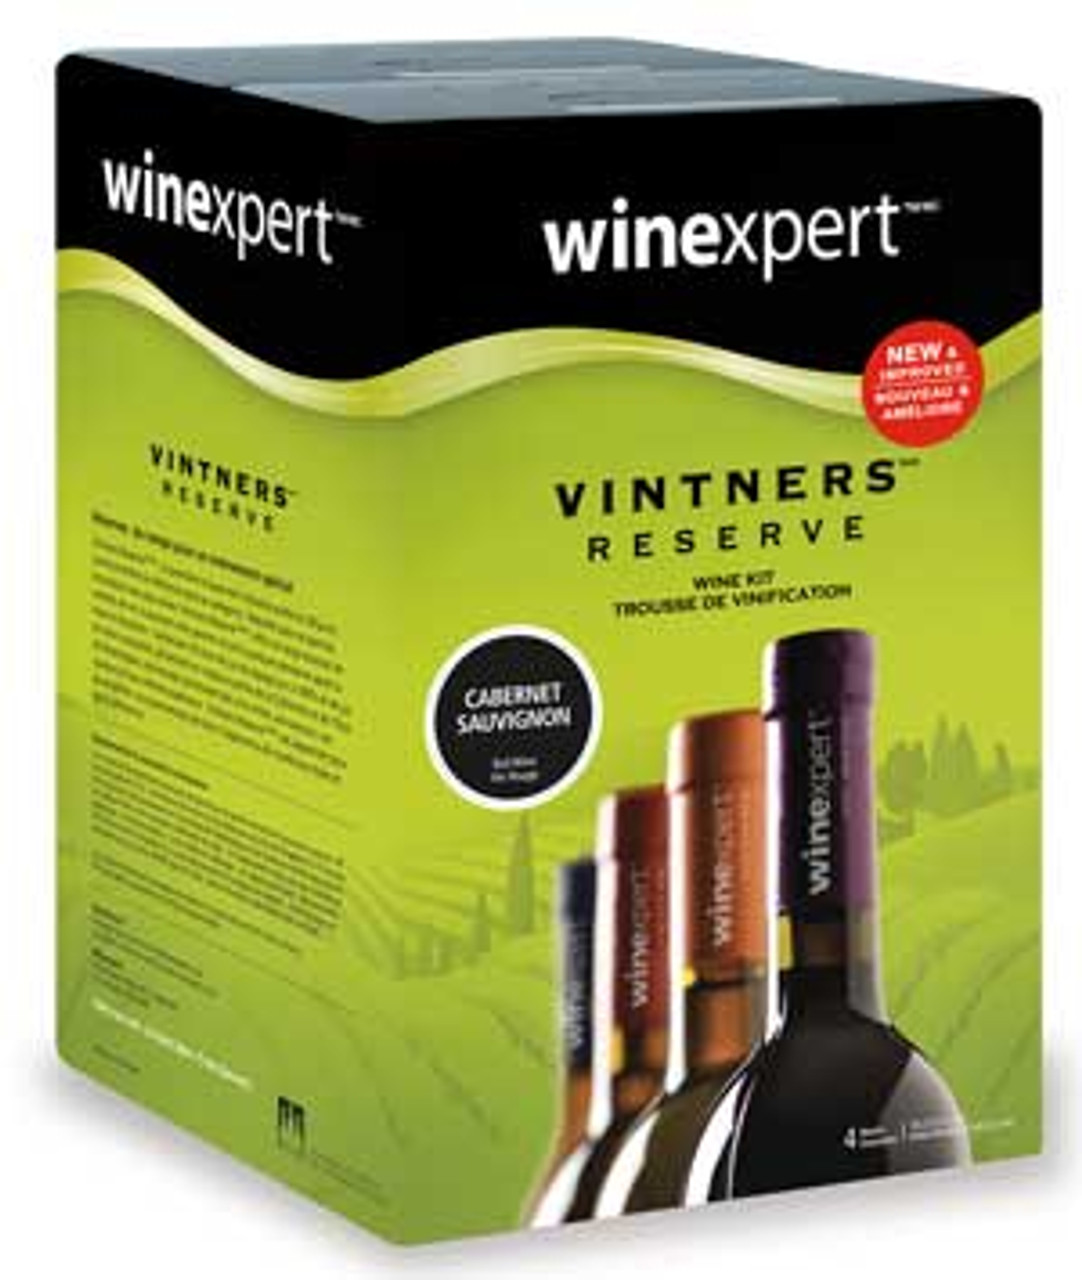 Vintners Reserve Riesling 10l Wine Kit